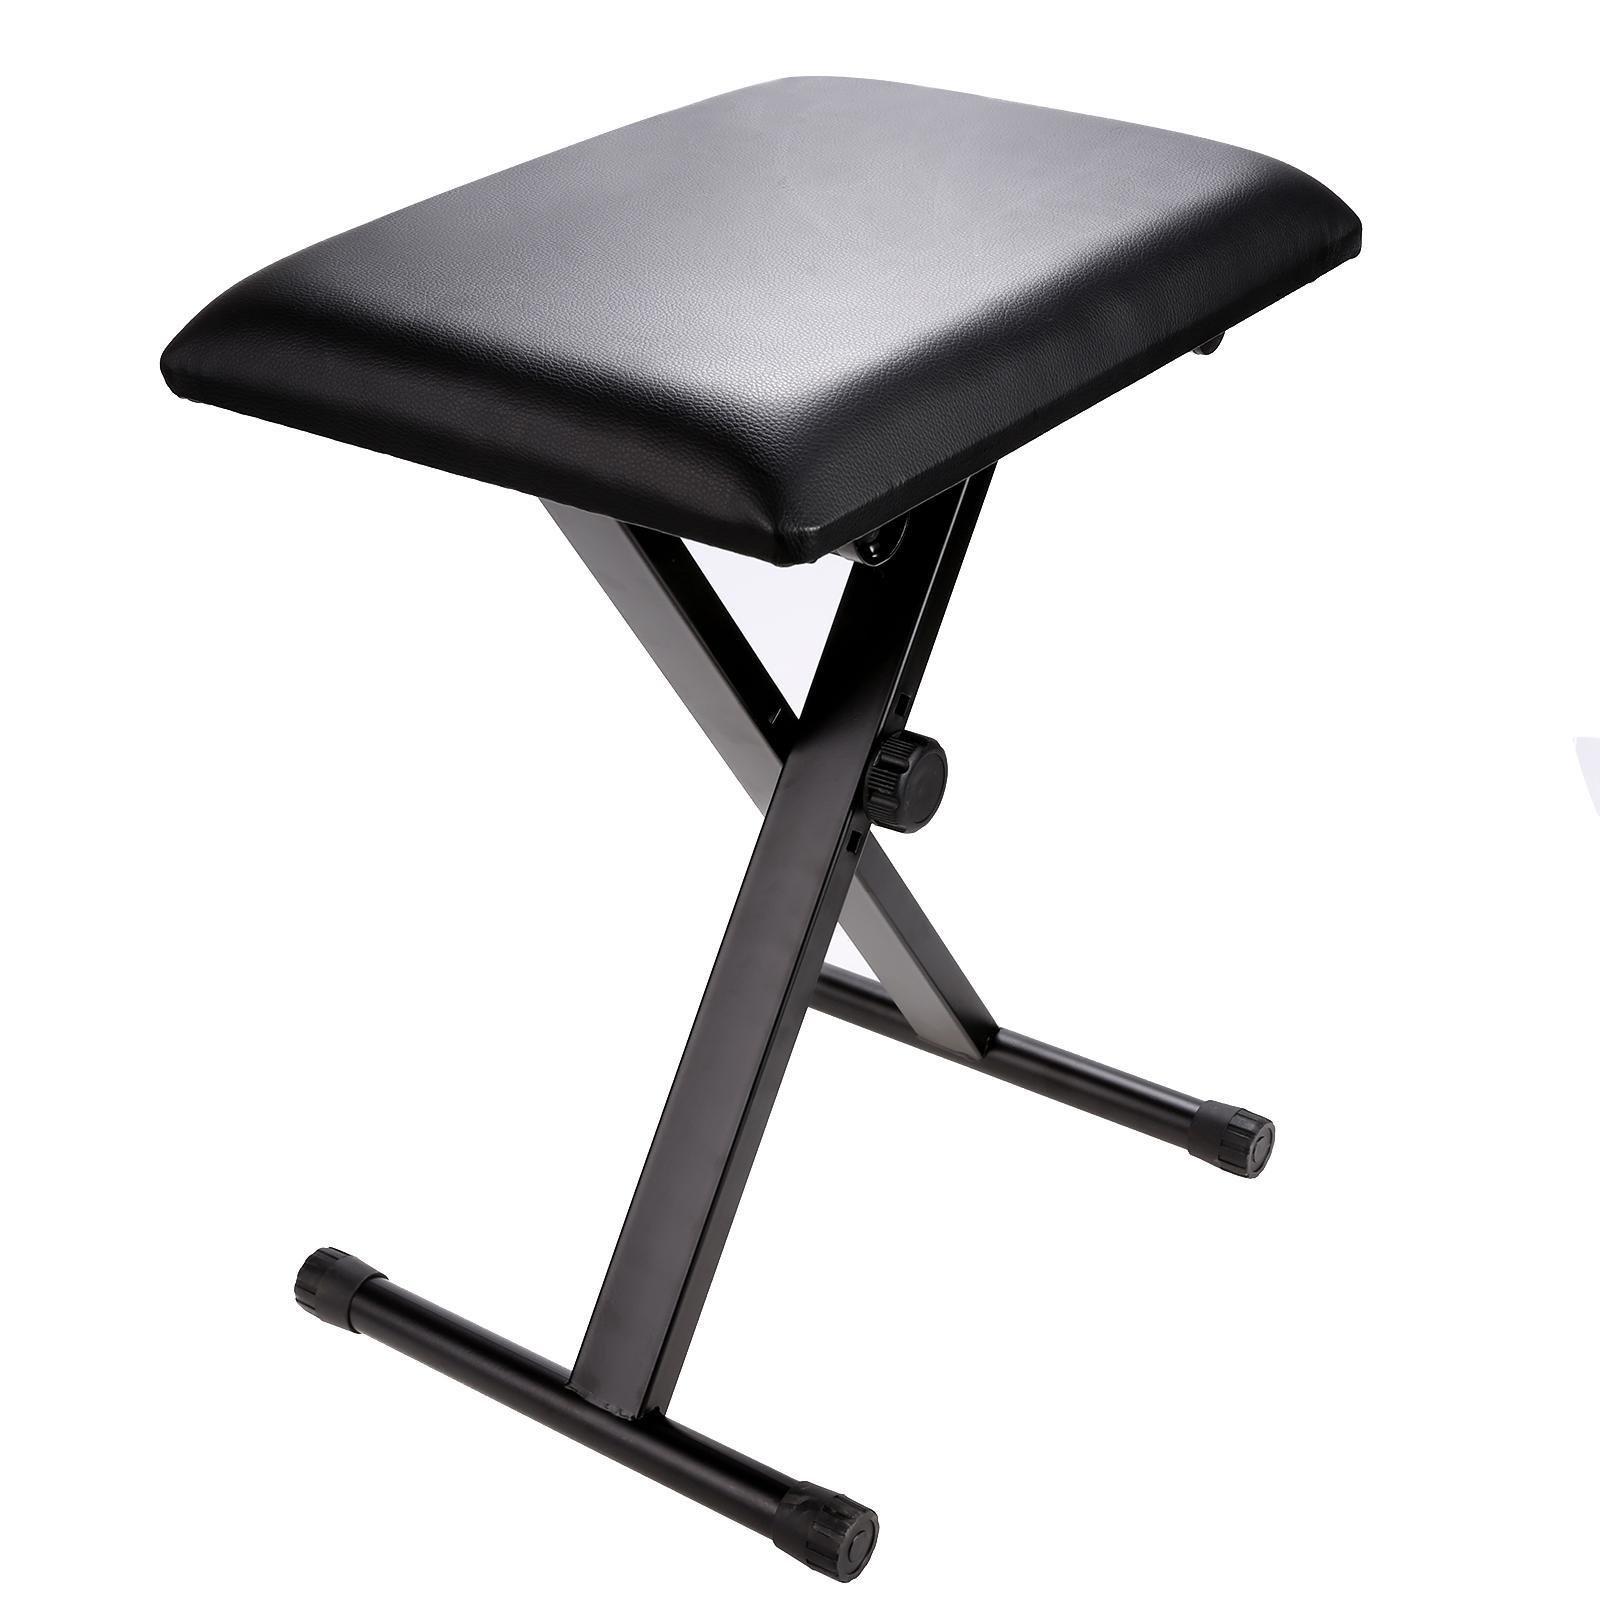 Miuniu Adjustable Piano Keyboard Bench Leather Padded Seat Folding Stool Chair (Black)